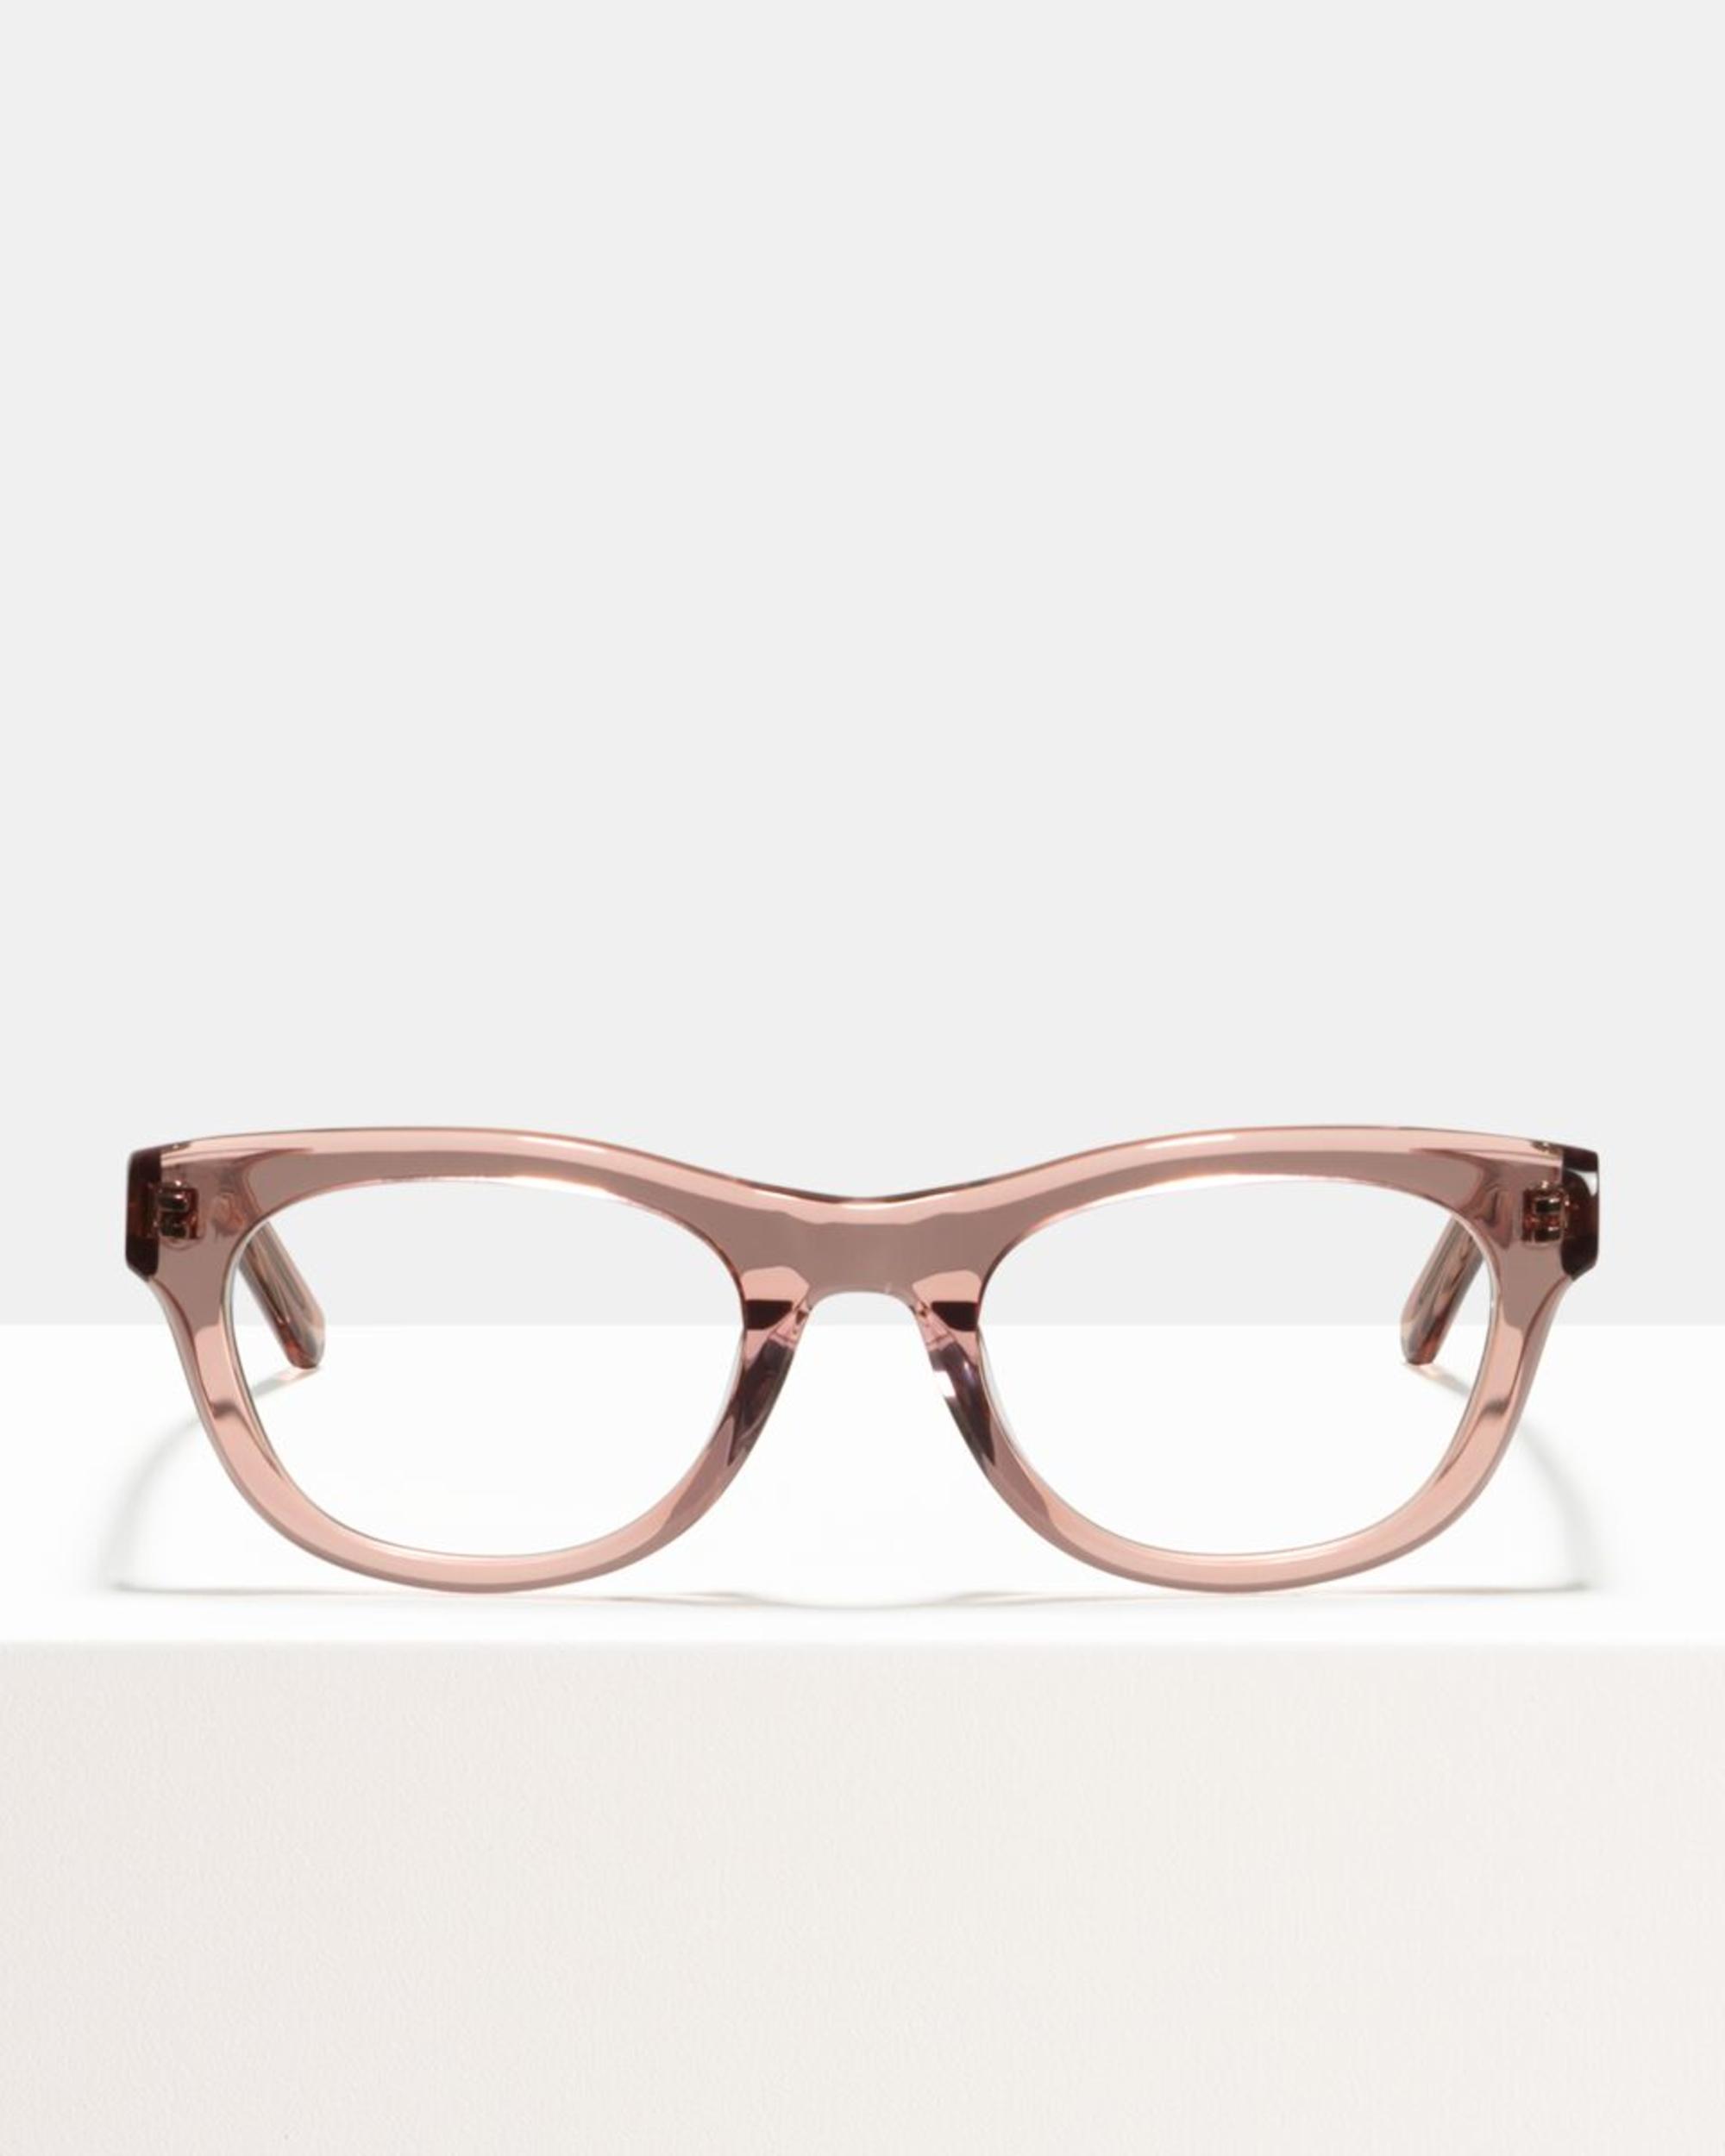 Ace & Tate Glasses |  acetaat in Roze